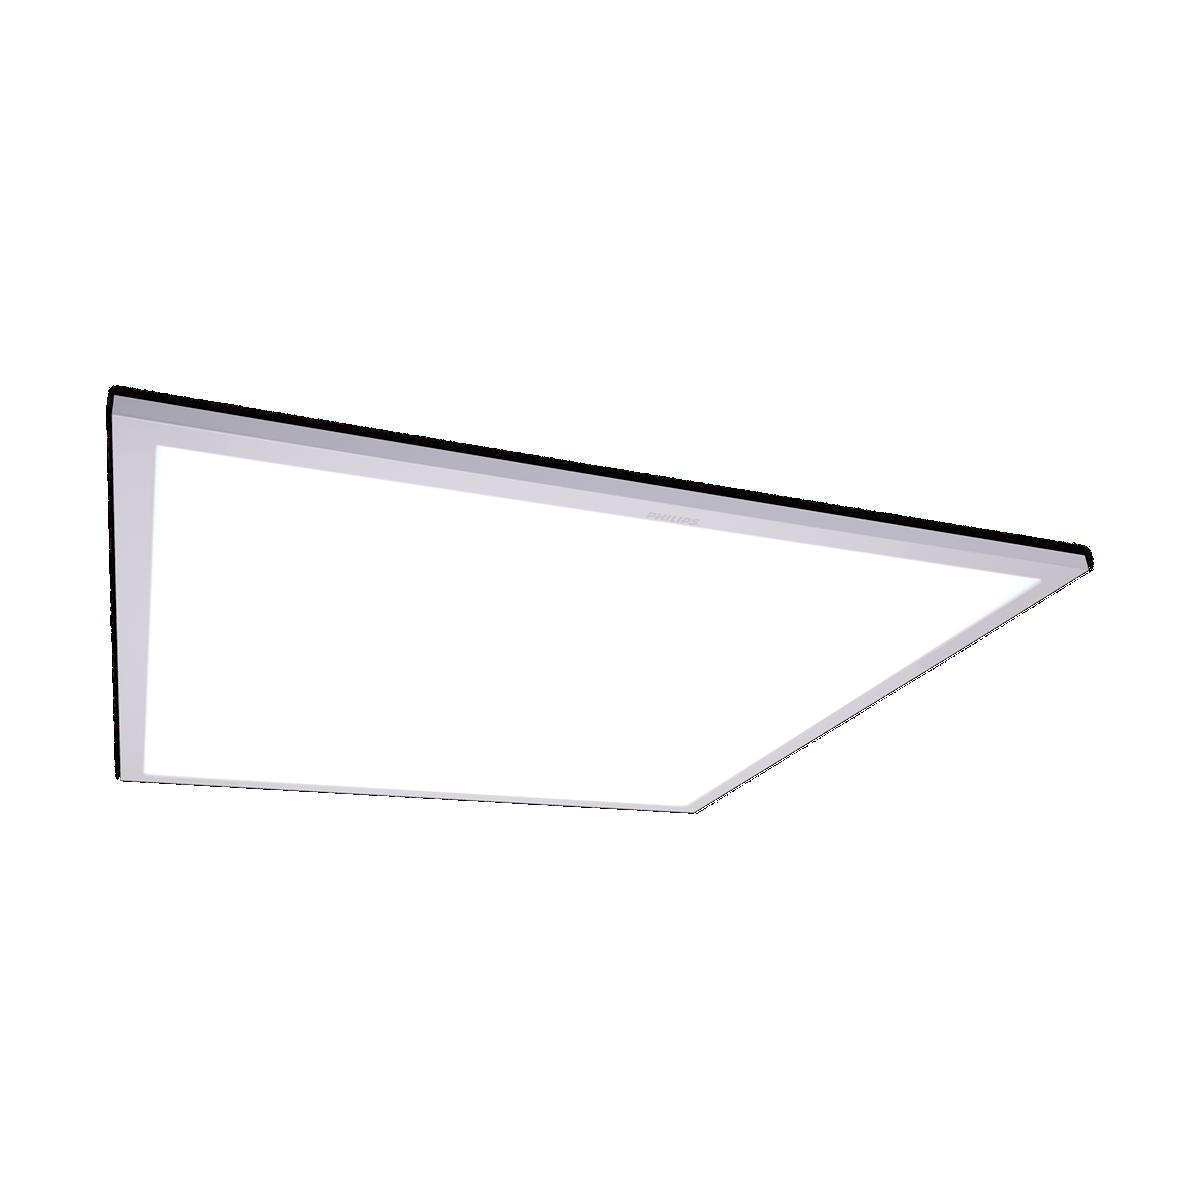 SmartBright Slim Panel